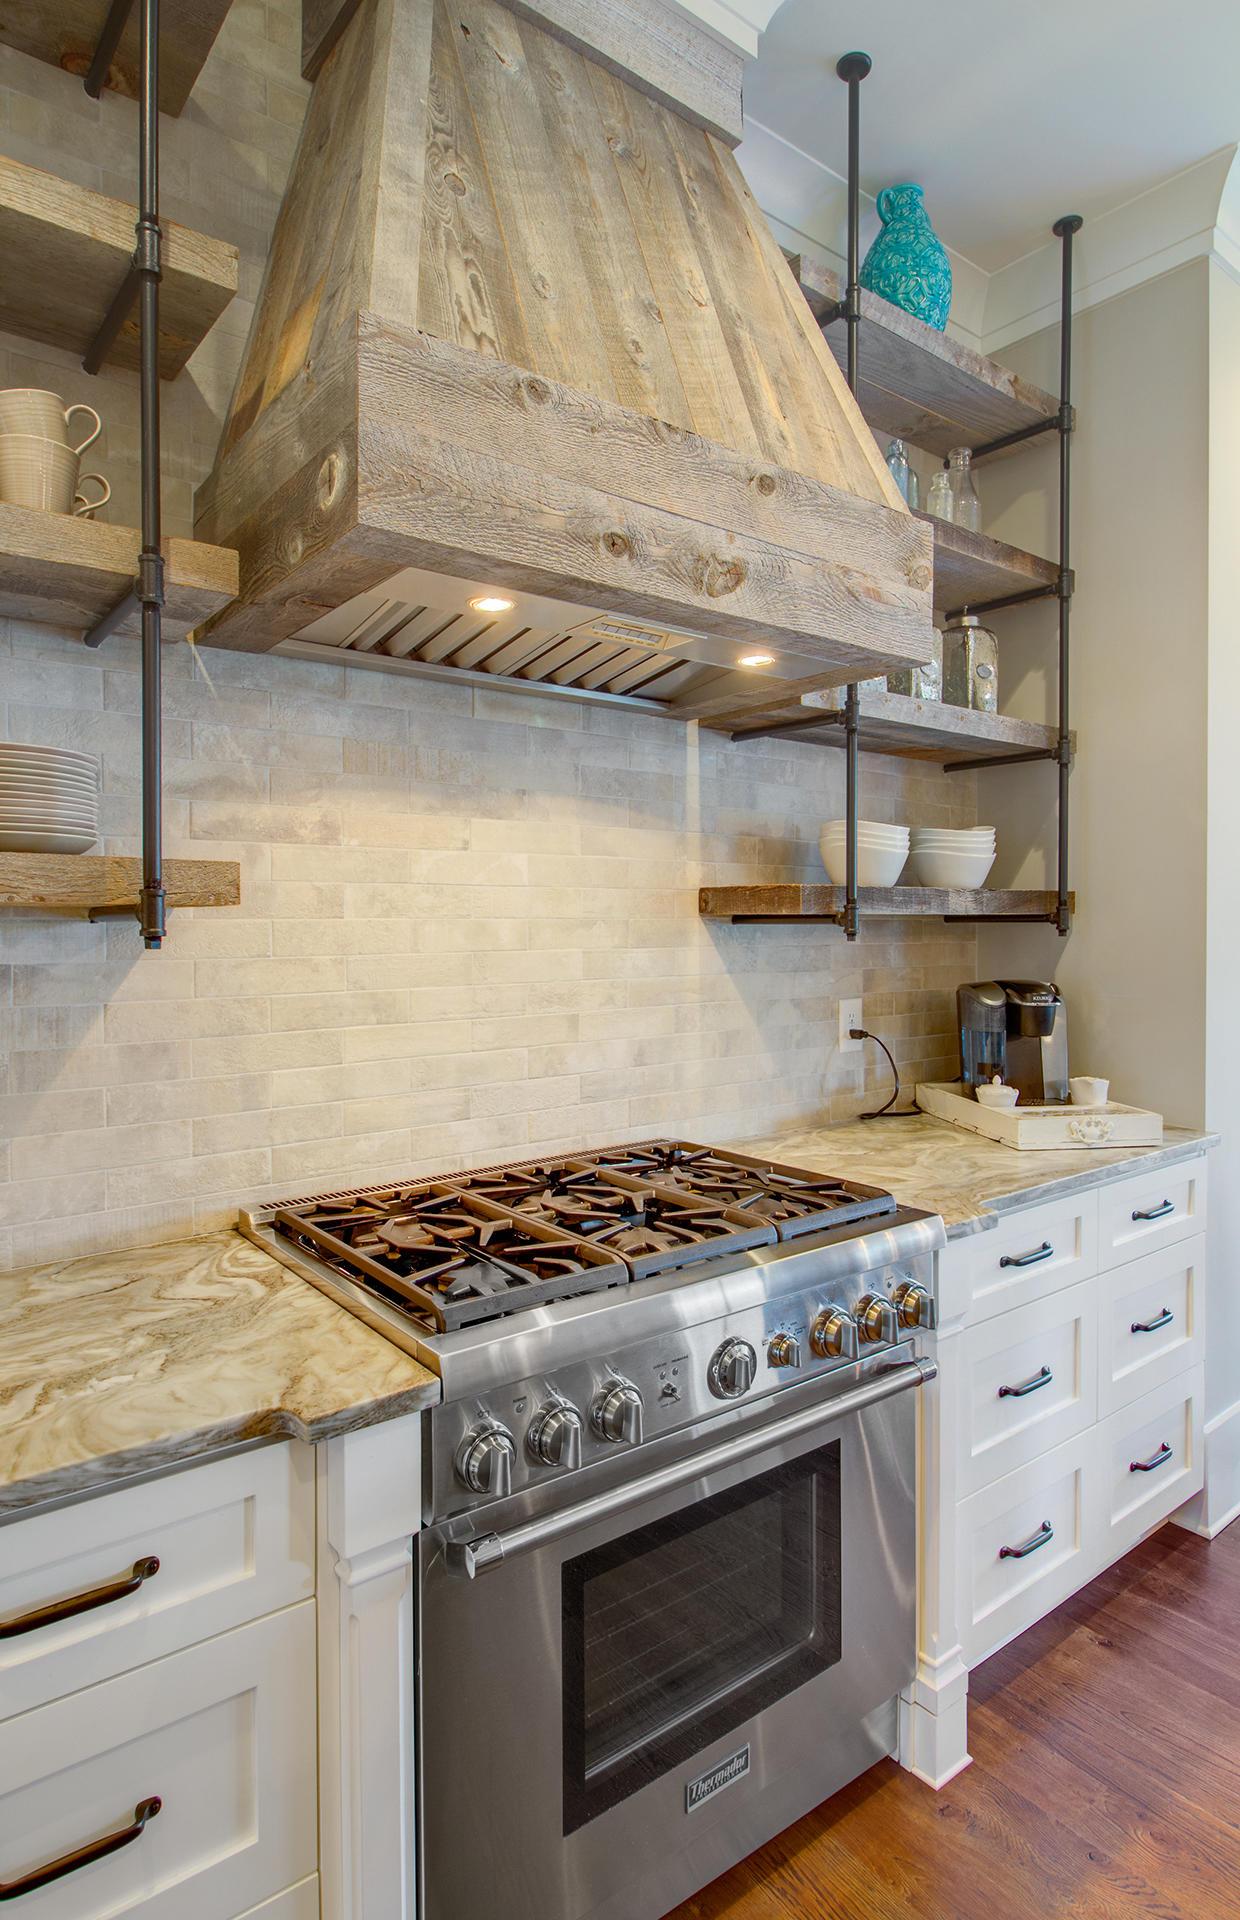 Daniel Island Park Homes For Sale - 117 Brailsford, Charleston, SC - 9